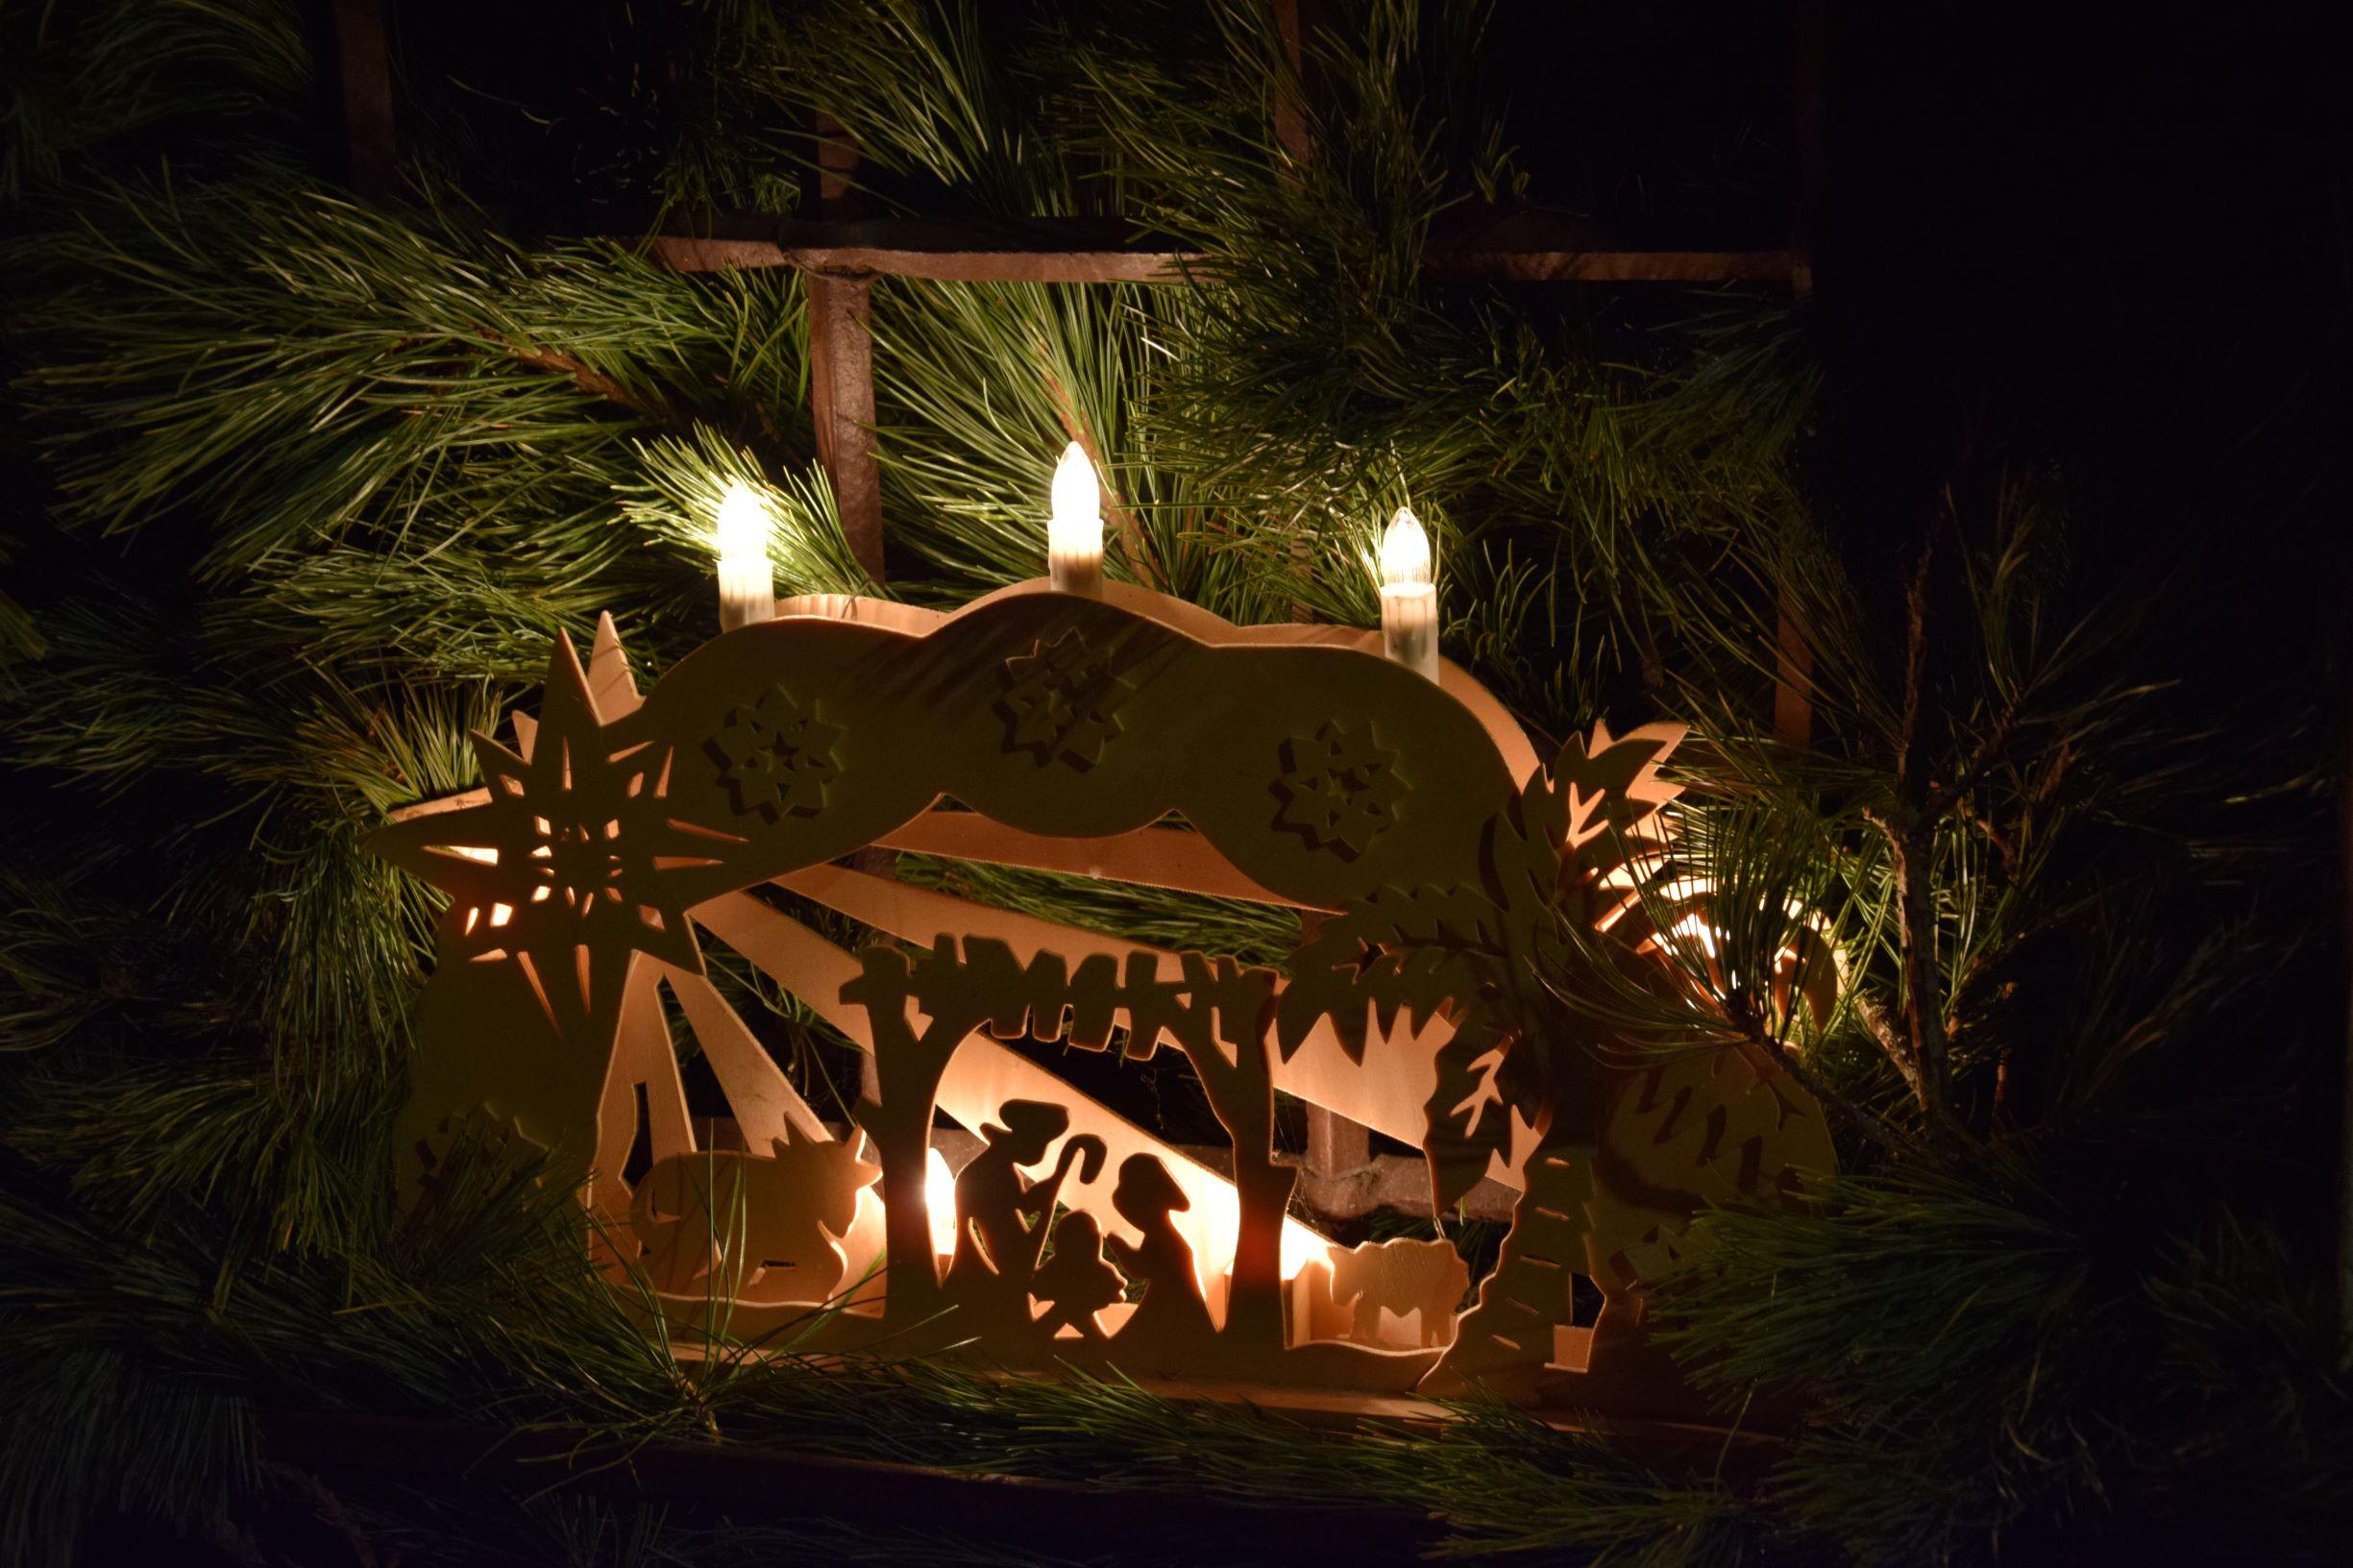 Natale in Val di Fiemme: 3 appuntamenti da non perdere 1